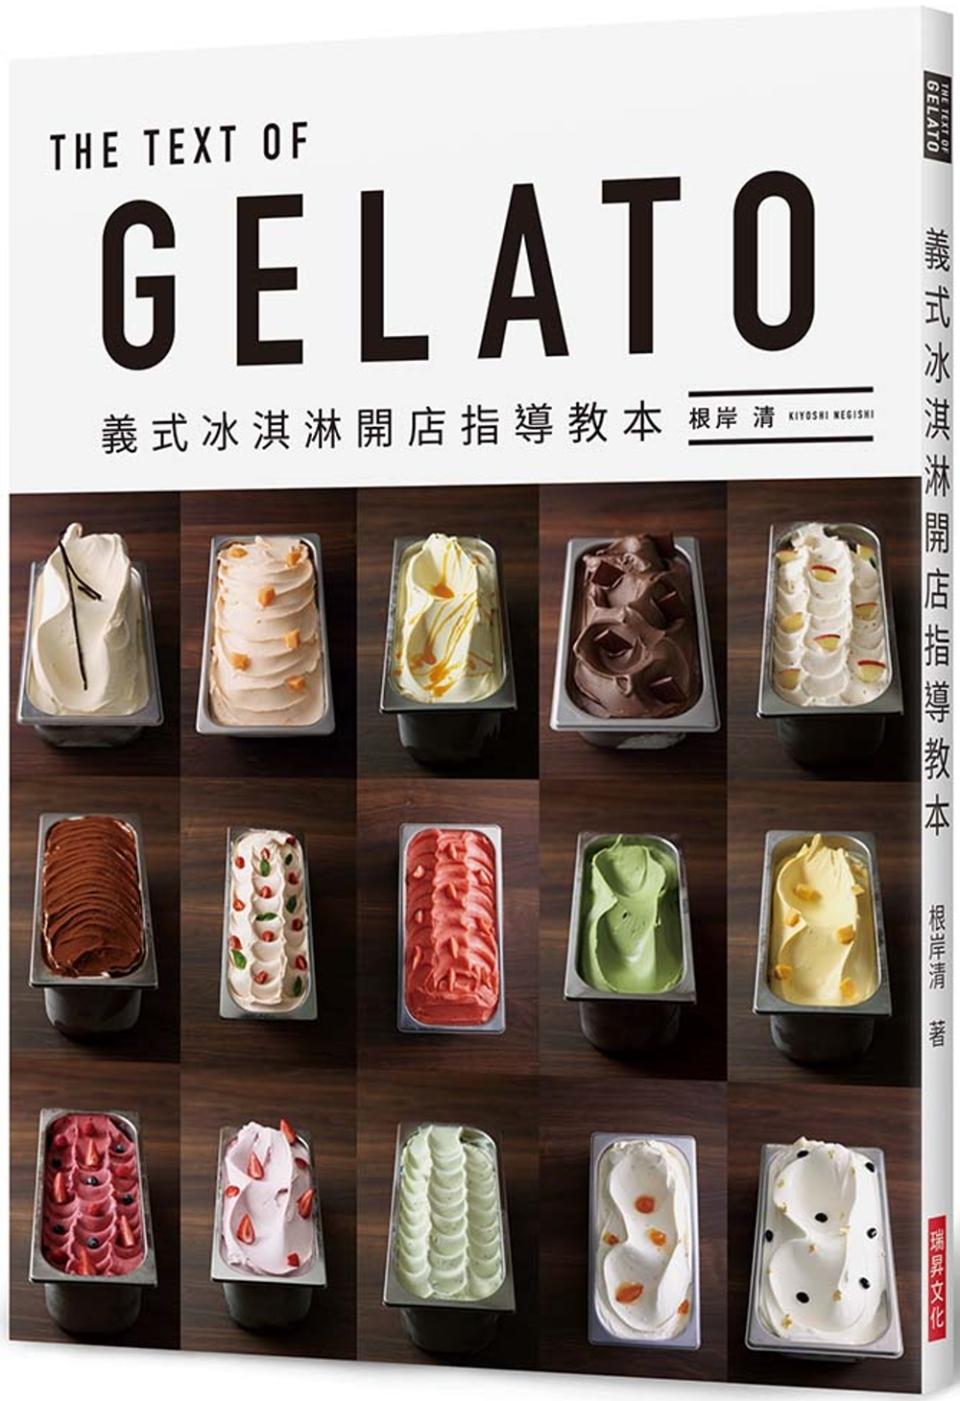 GELATO 義式冰淇淋開店指...